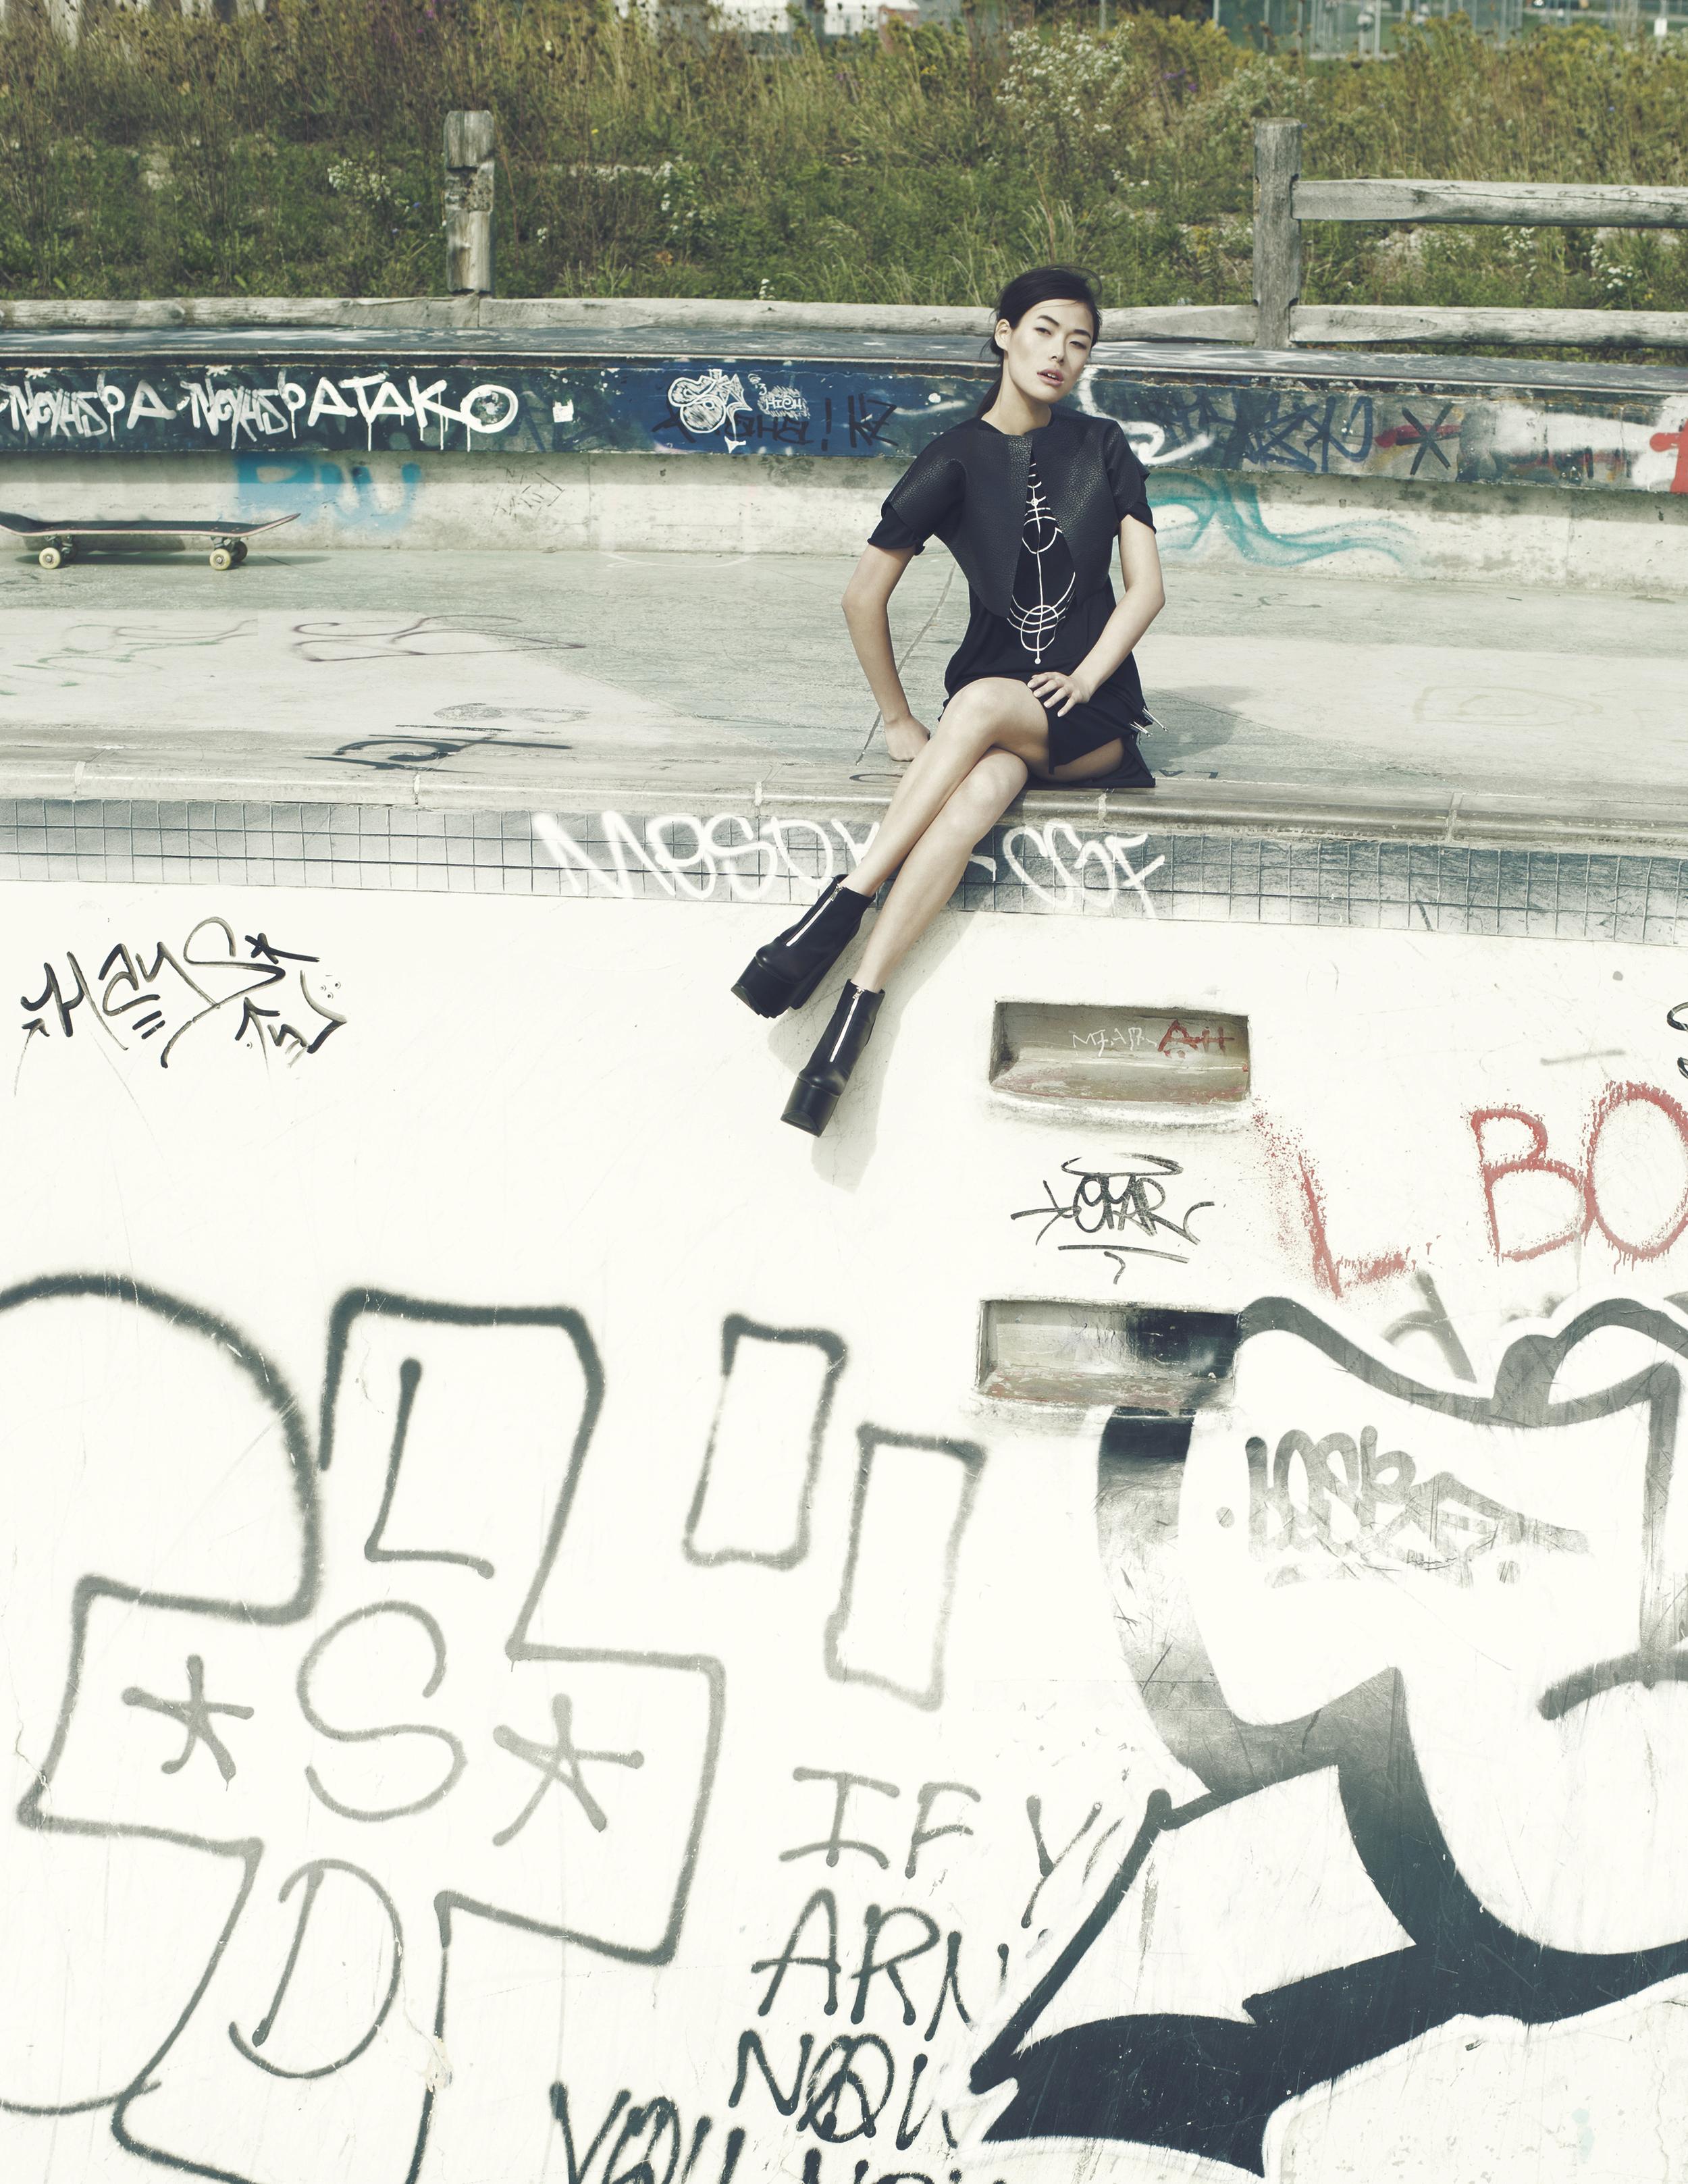 Roberto_Vazquez_Photography_skate1__013.jpg